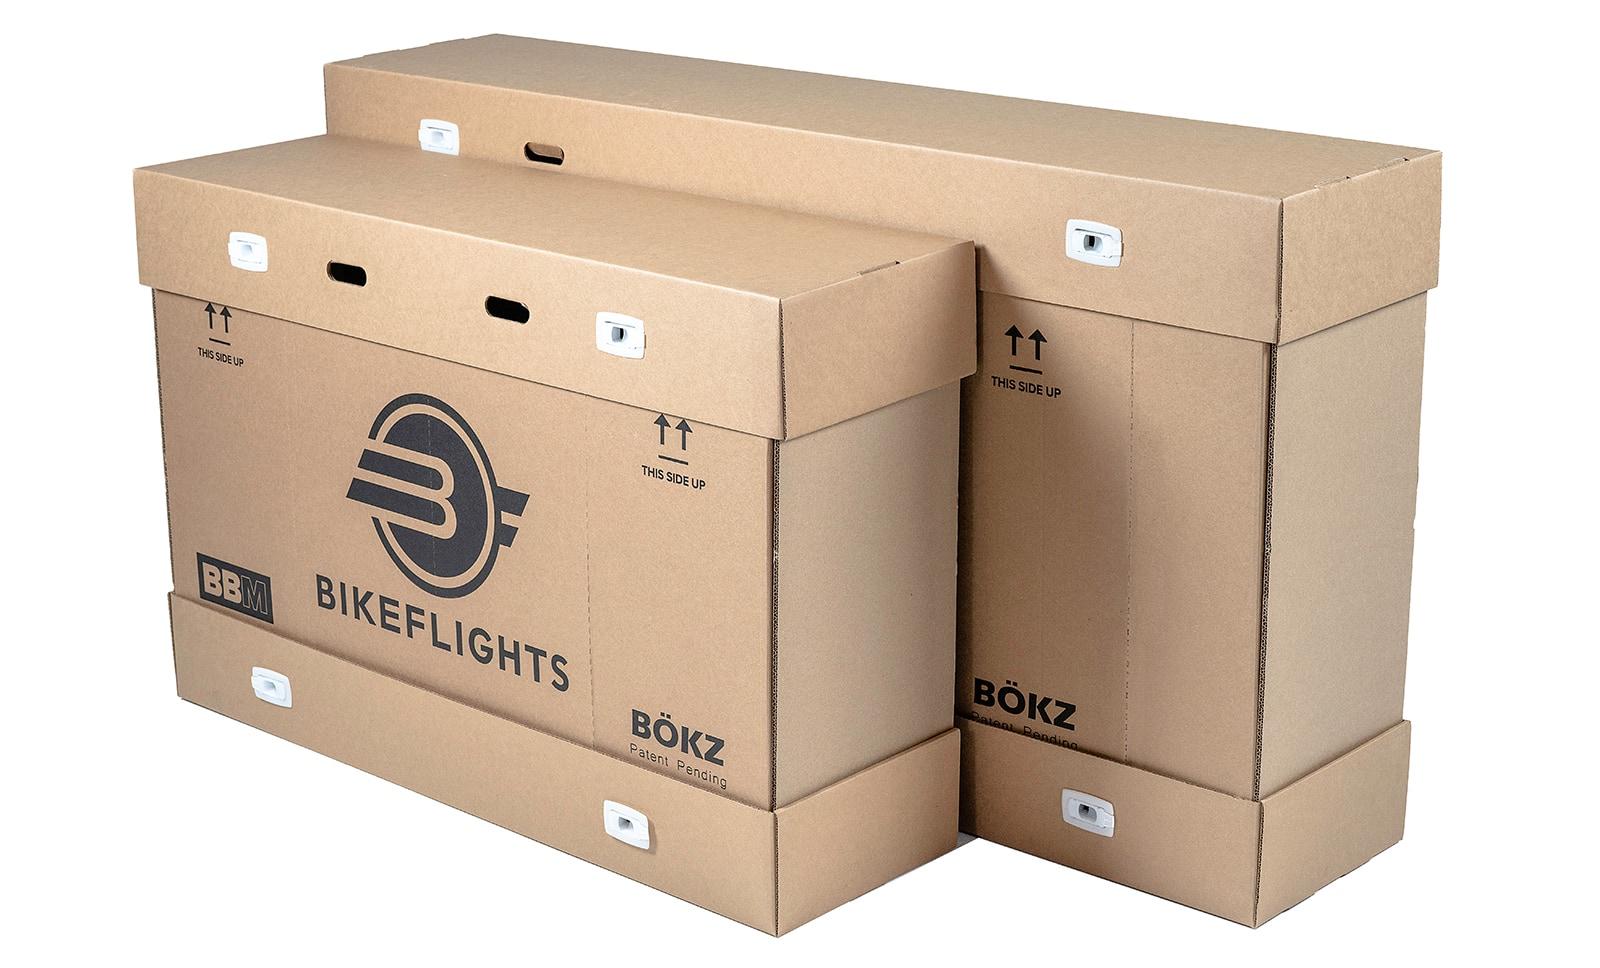 BikeFlights Bicycle Shipping Boxes